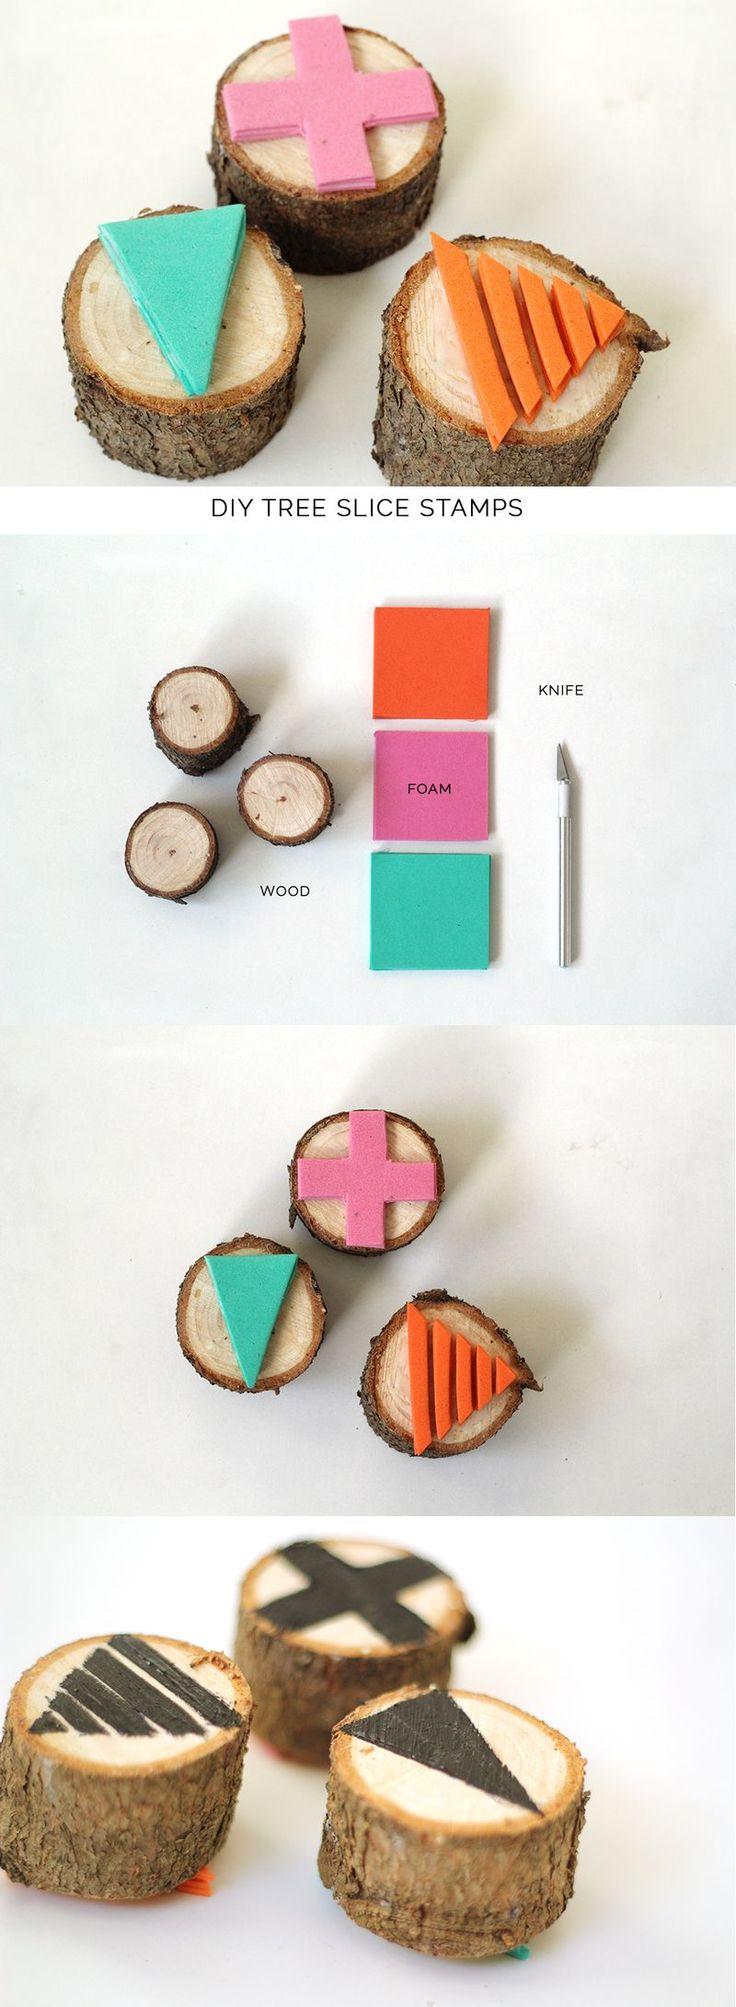 DIY tree branch stamps